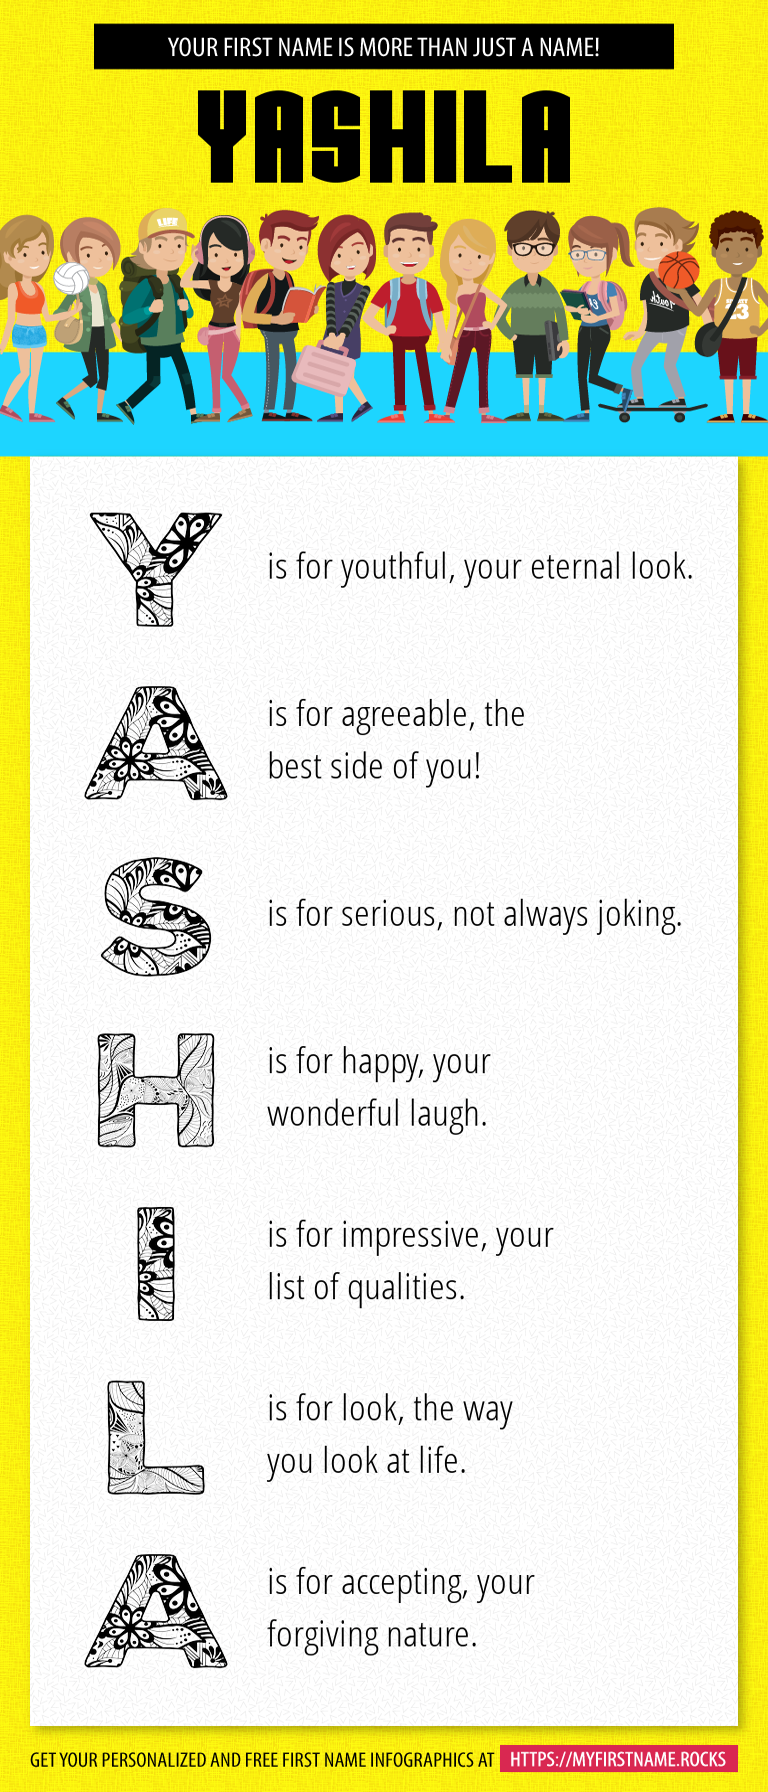 Yashila Infographics